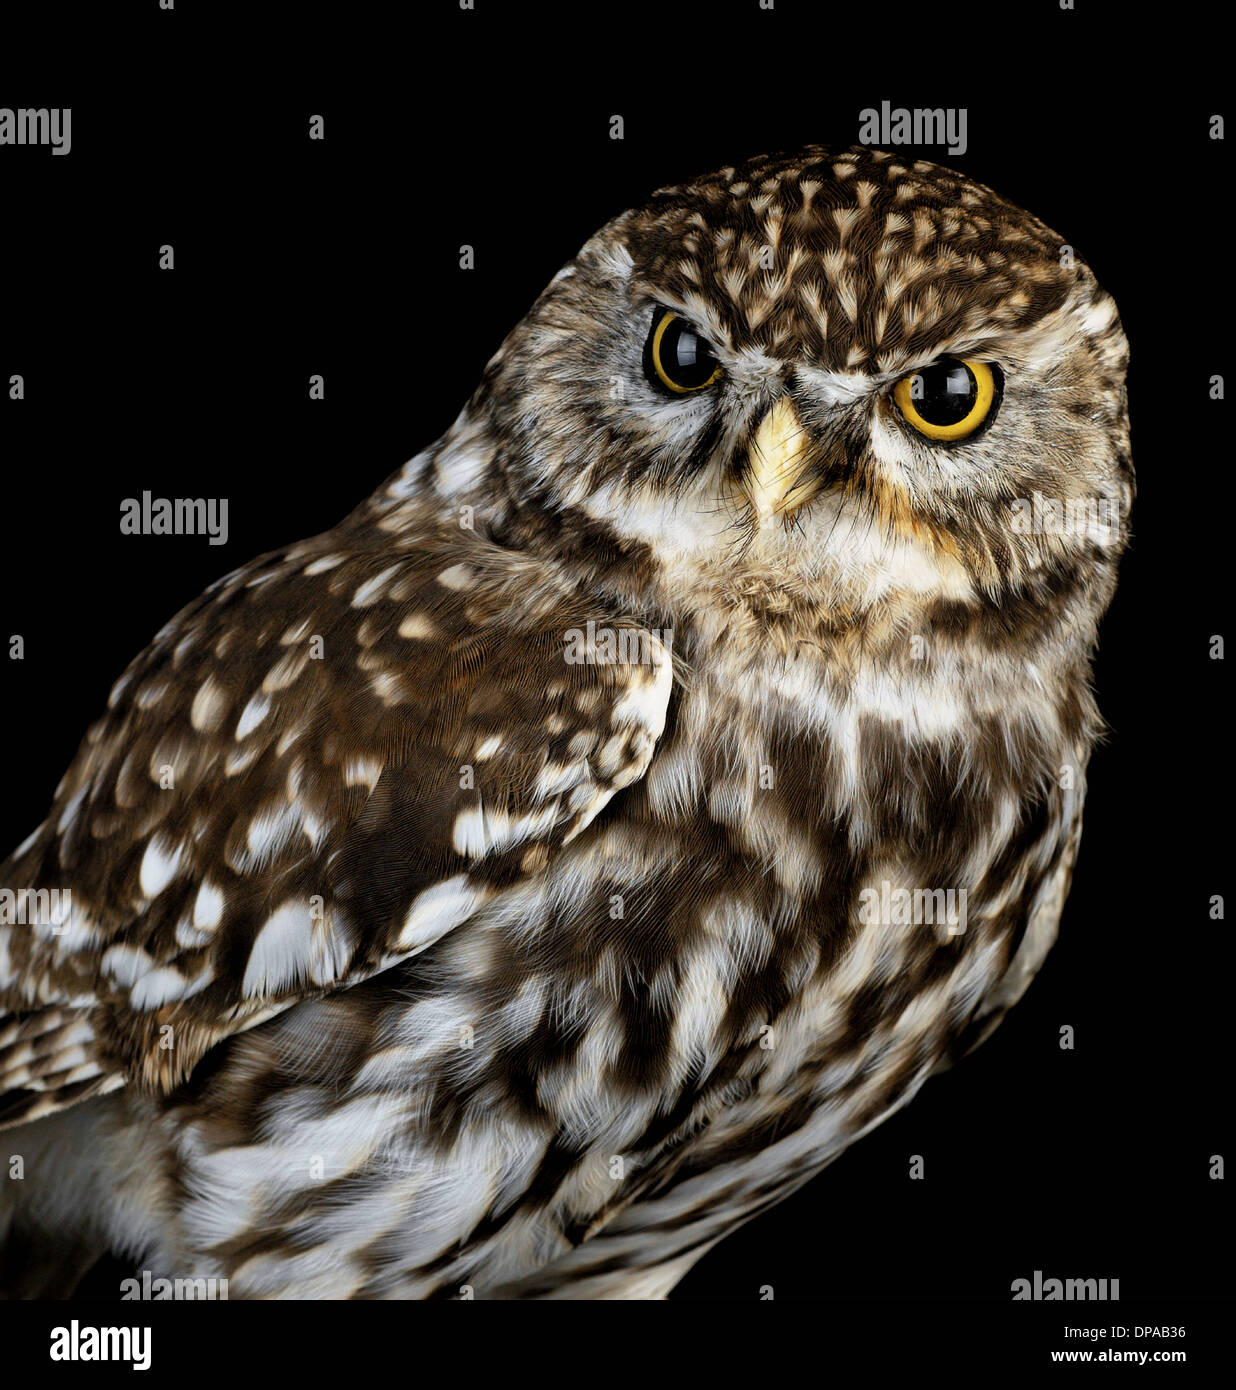 Little Owl - Stock Image